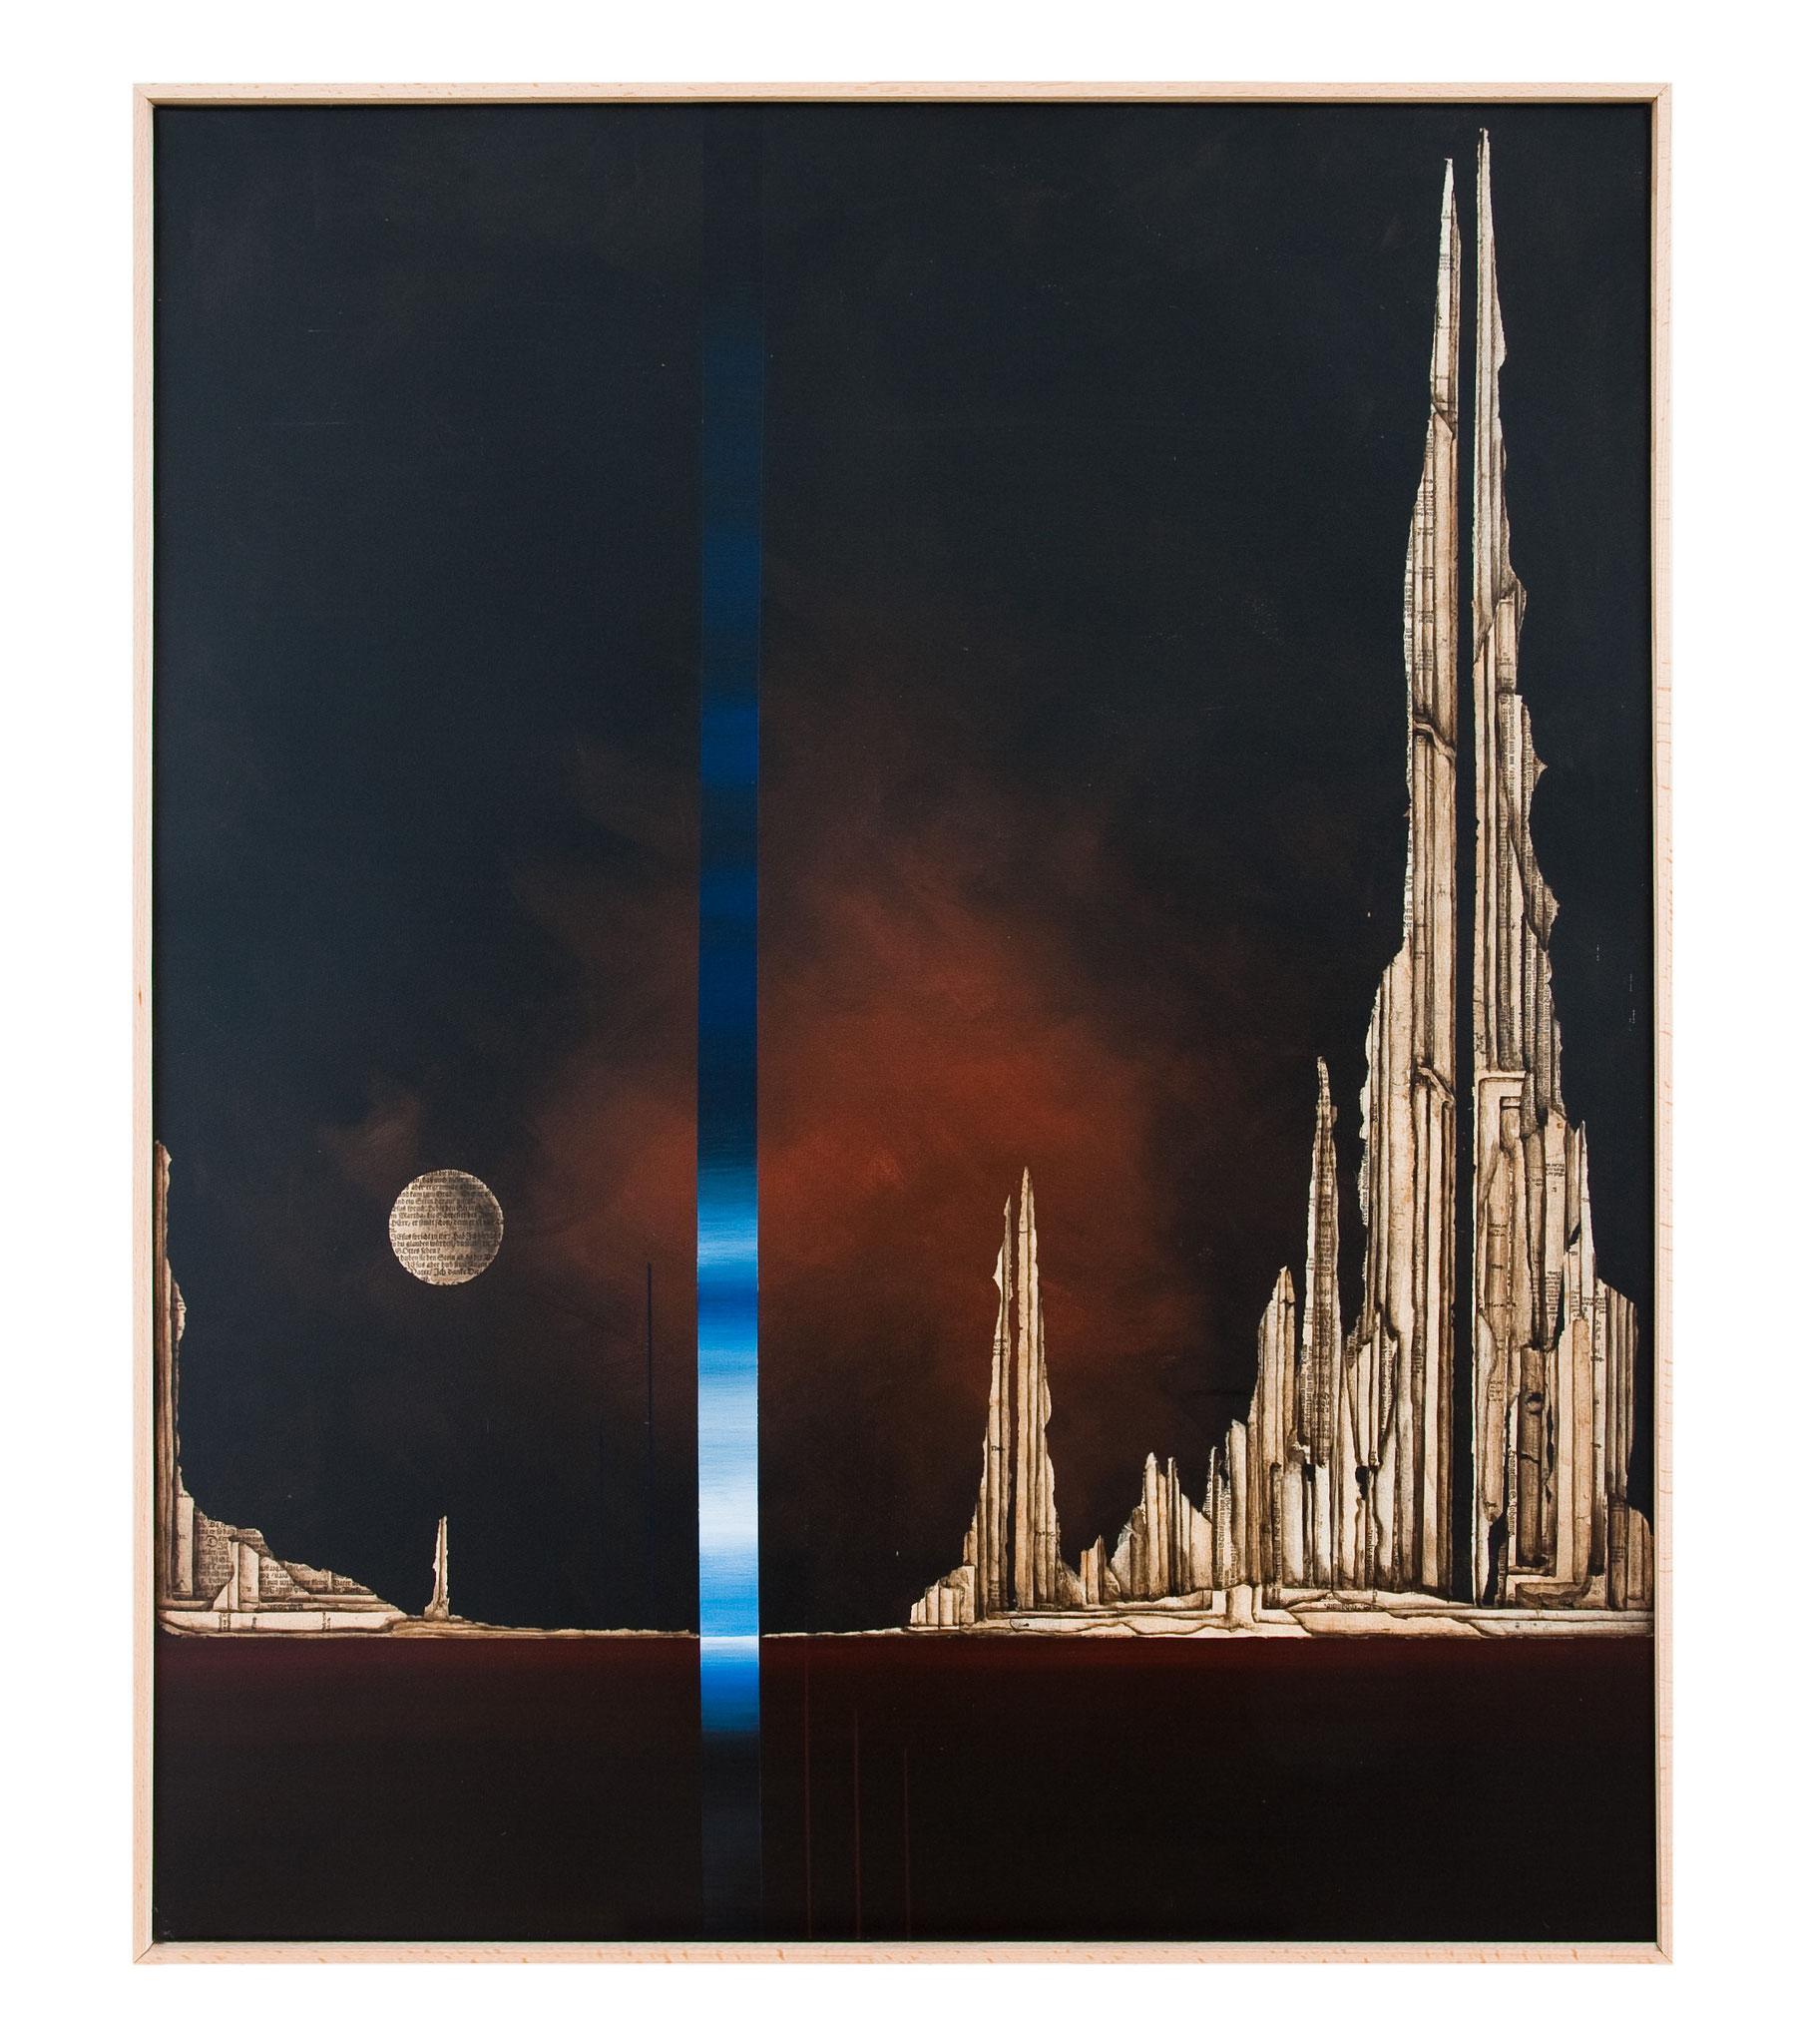 ZEIT (T) RAUM III - 2013 - Acryl, Tusche, Papier auf Leinwand  - 122 x102 cm